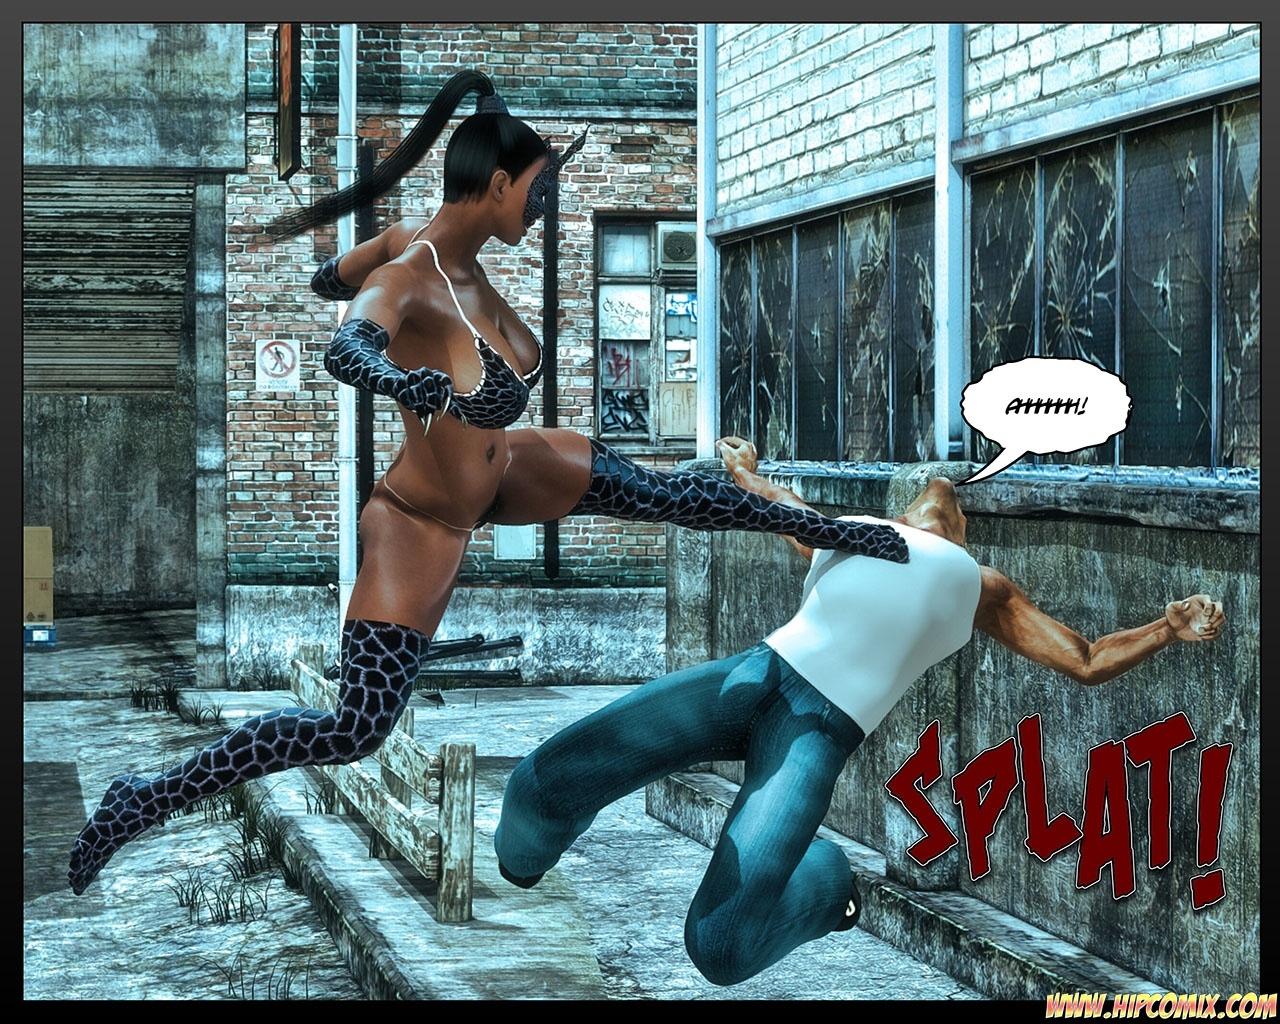 Panther-Girl-13 13 free sex comic